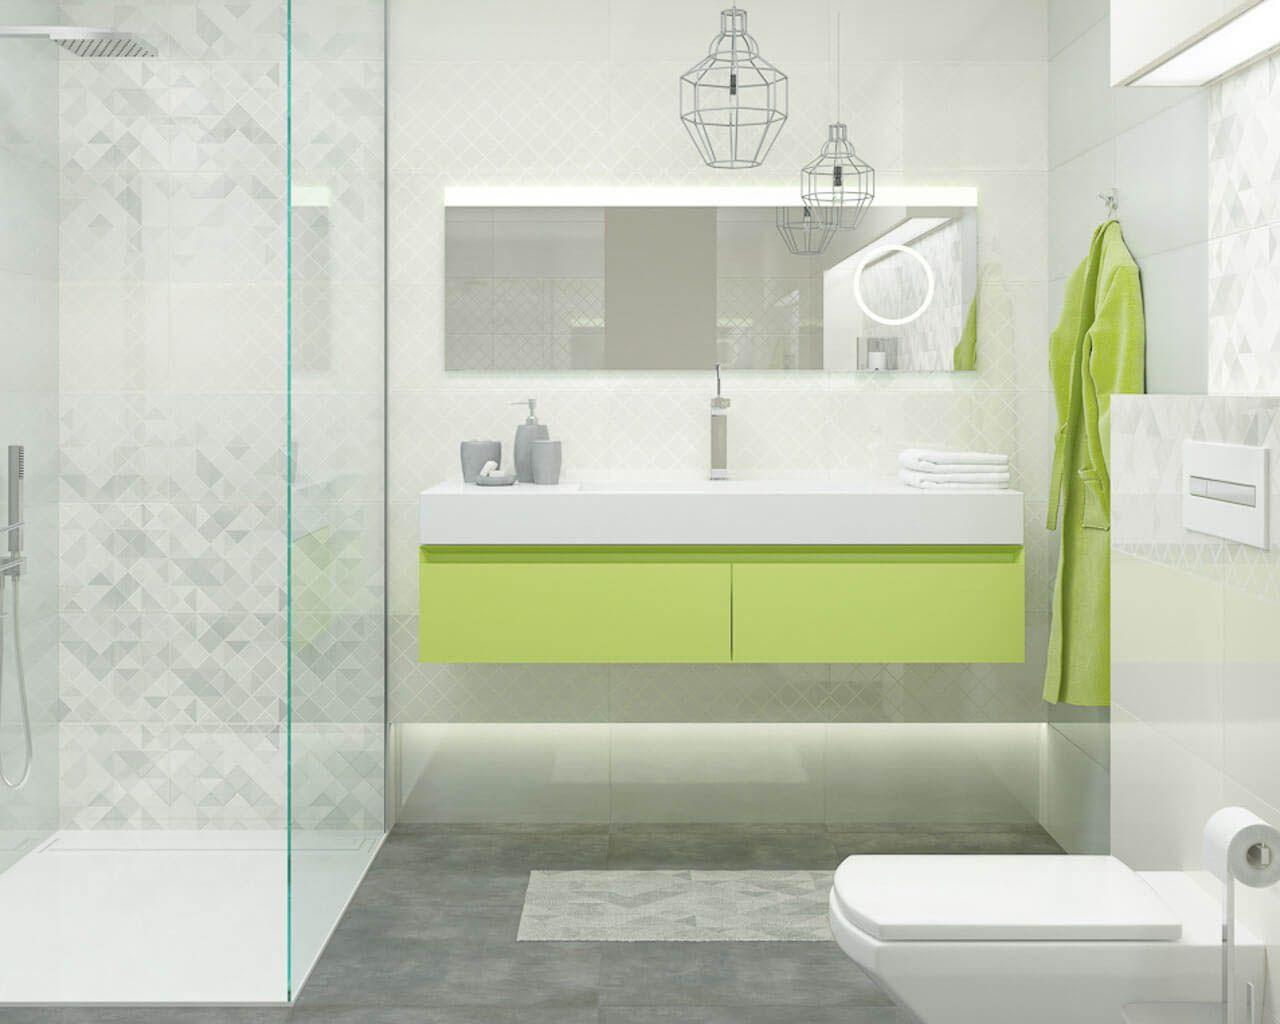 Small light grey bathroom in a minimalistic style | Ceramika Paradyz